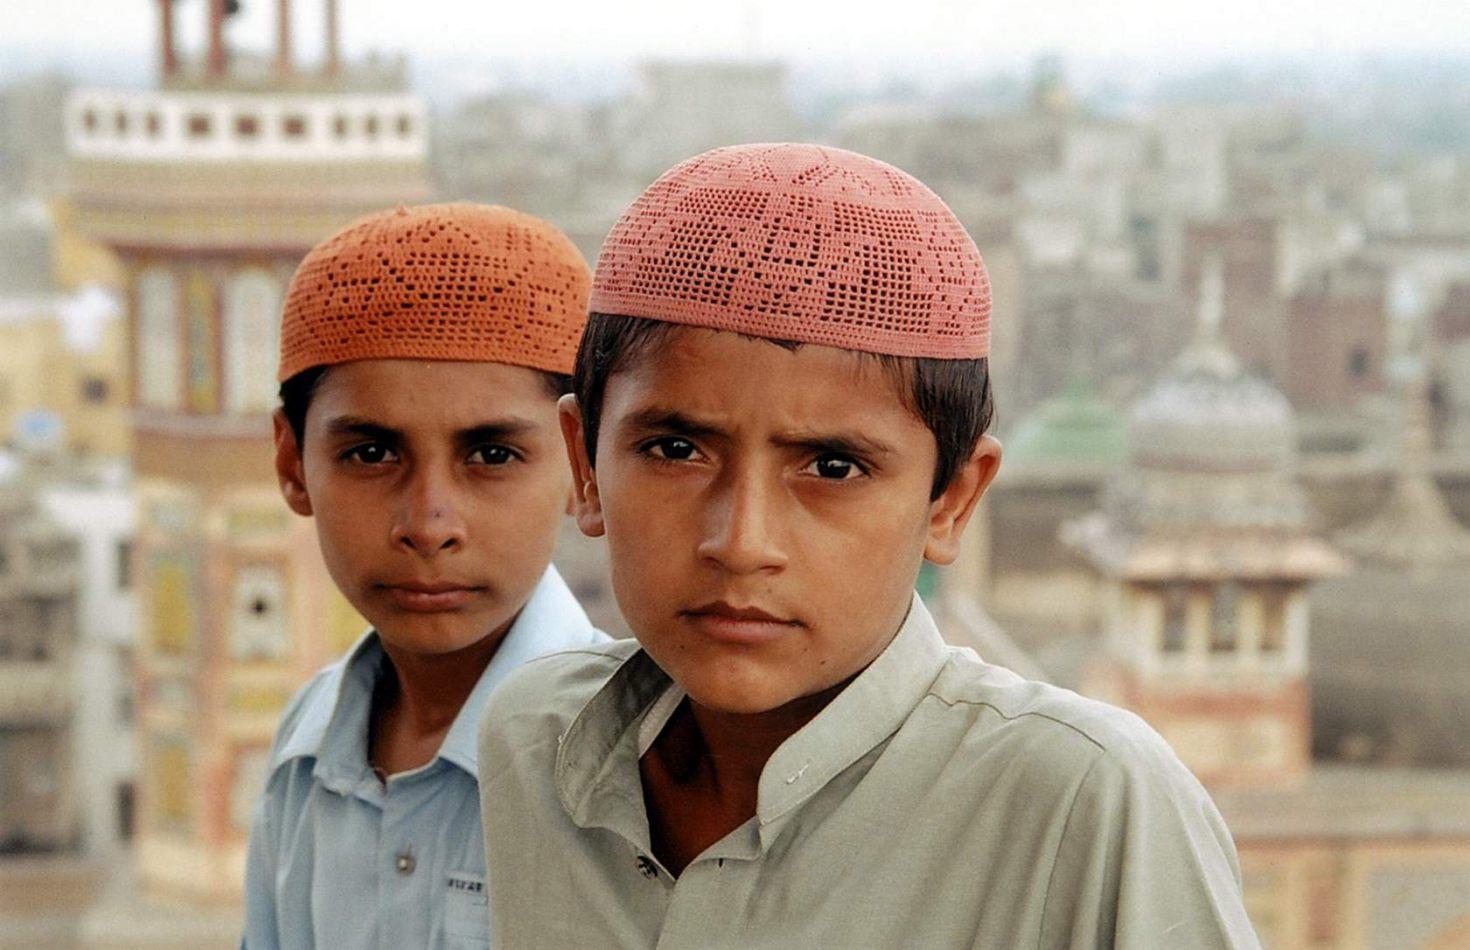 Anthony Ellis Photography: Zindabad - Two Boys at the Top of Wazir Khan Minaret